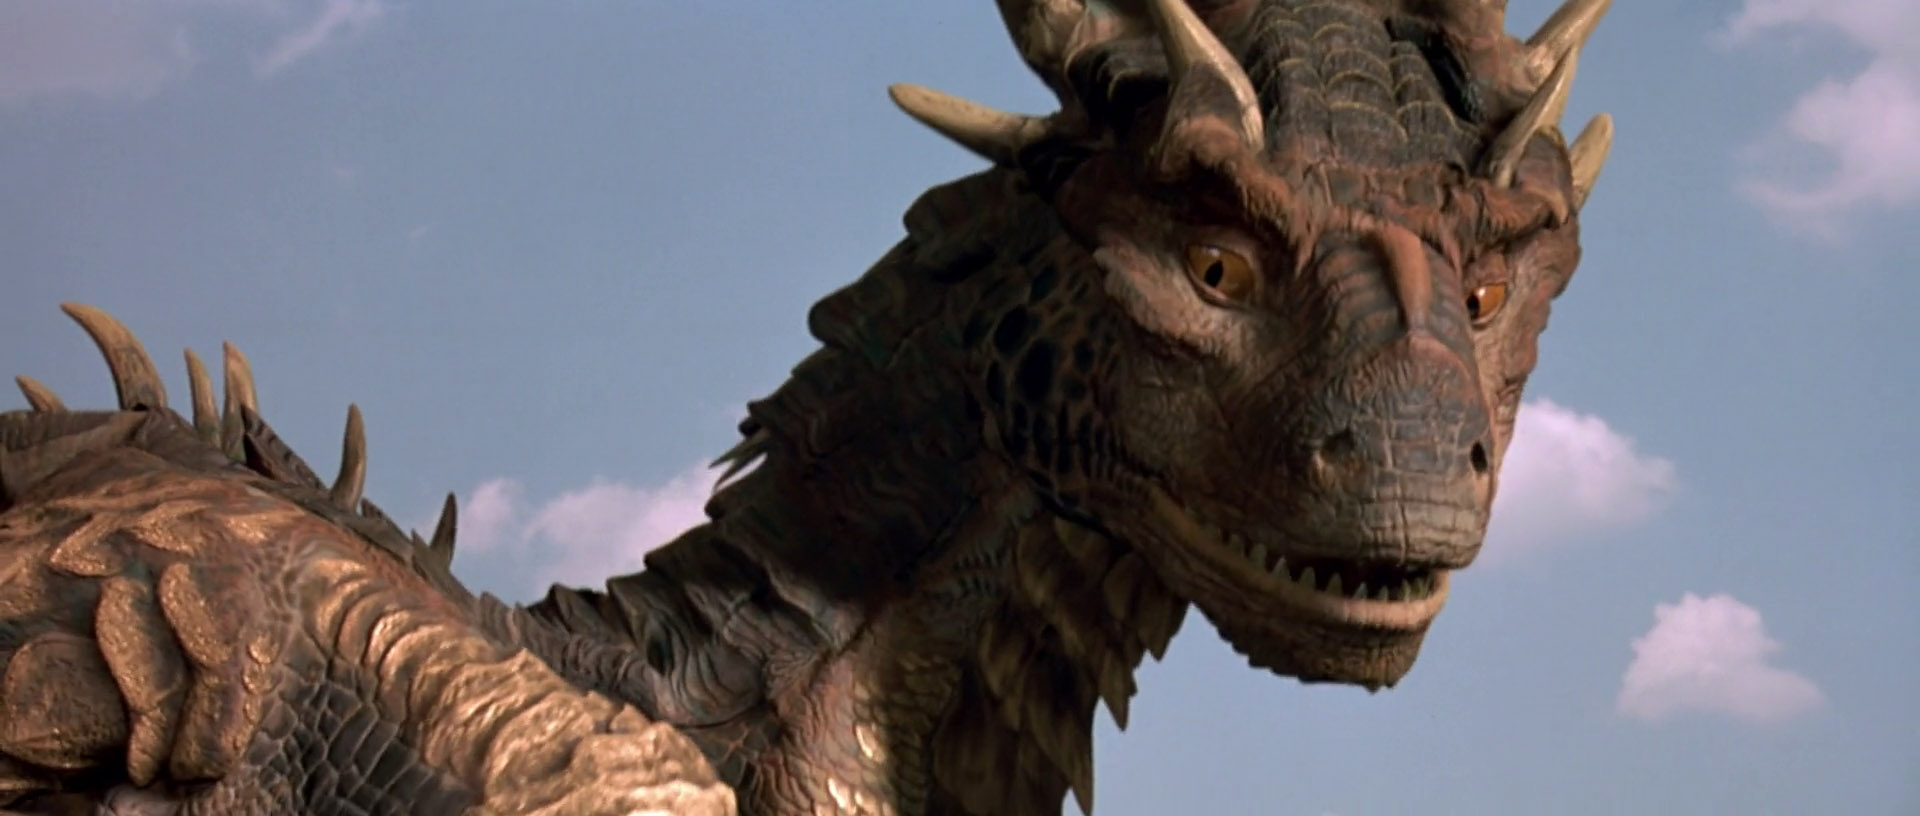 Dragonheart 1996